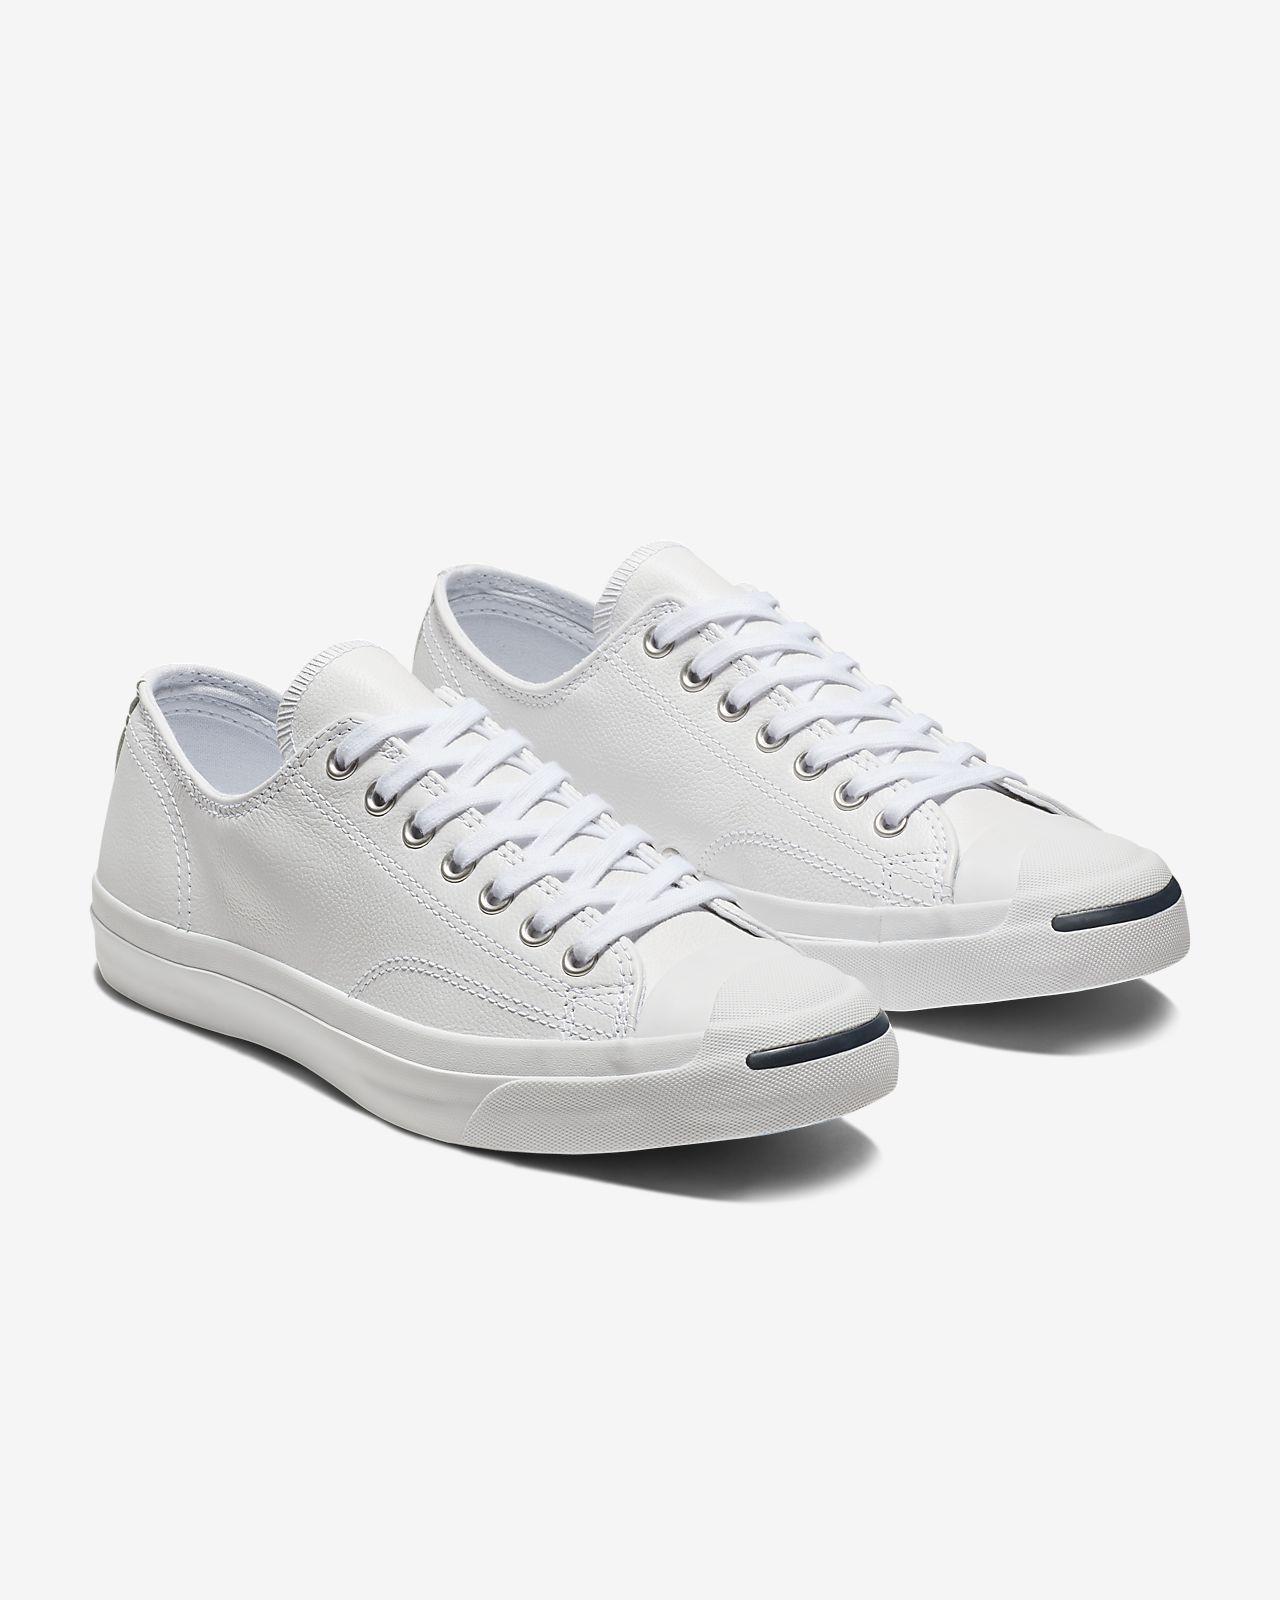 0fda995ff7d8 ... good converse jack purcell tumbled leather low top unisex shoe 6e3e5  f104c